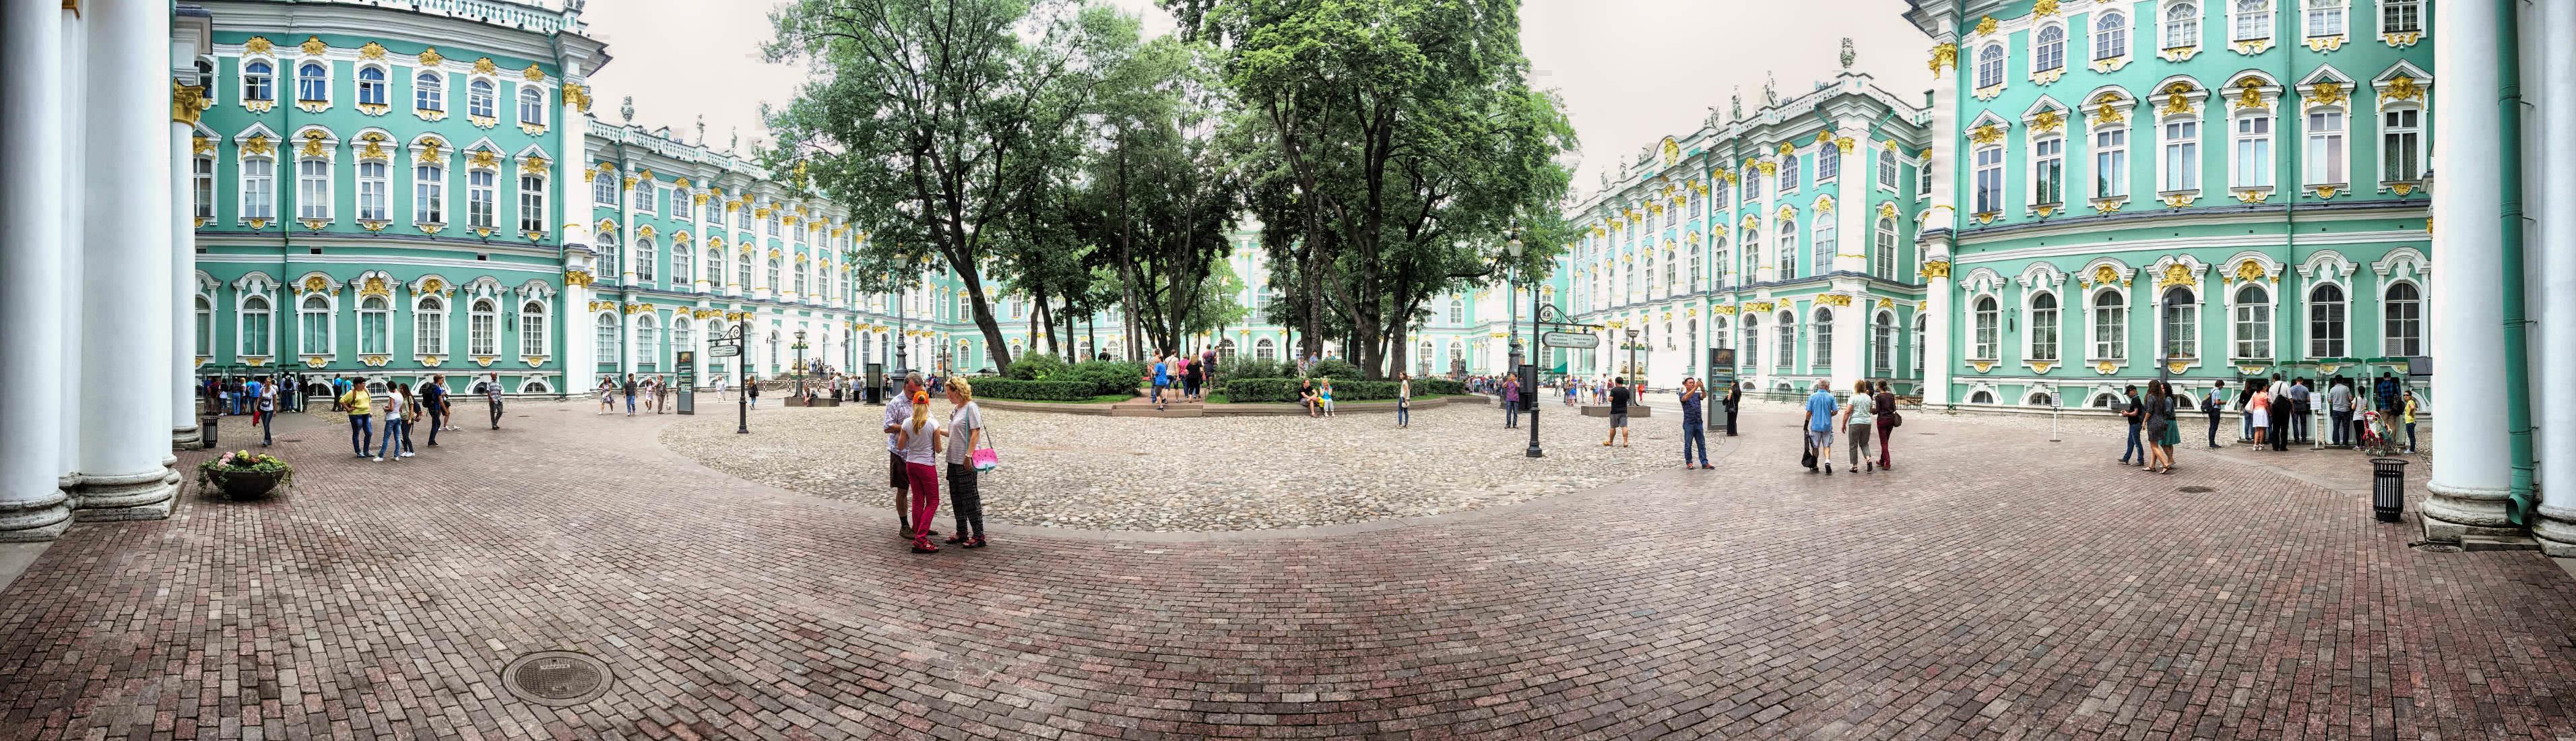 St. Petersburg Winterpalast Innenhof